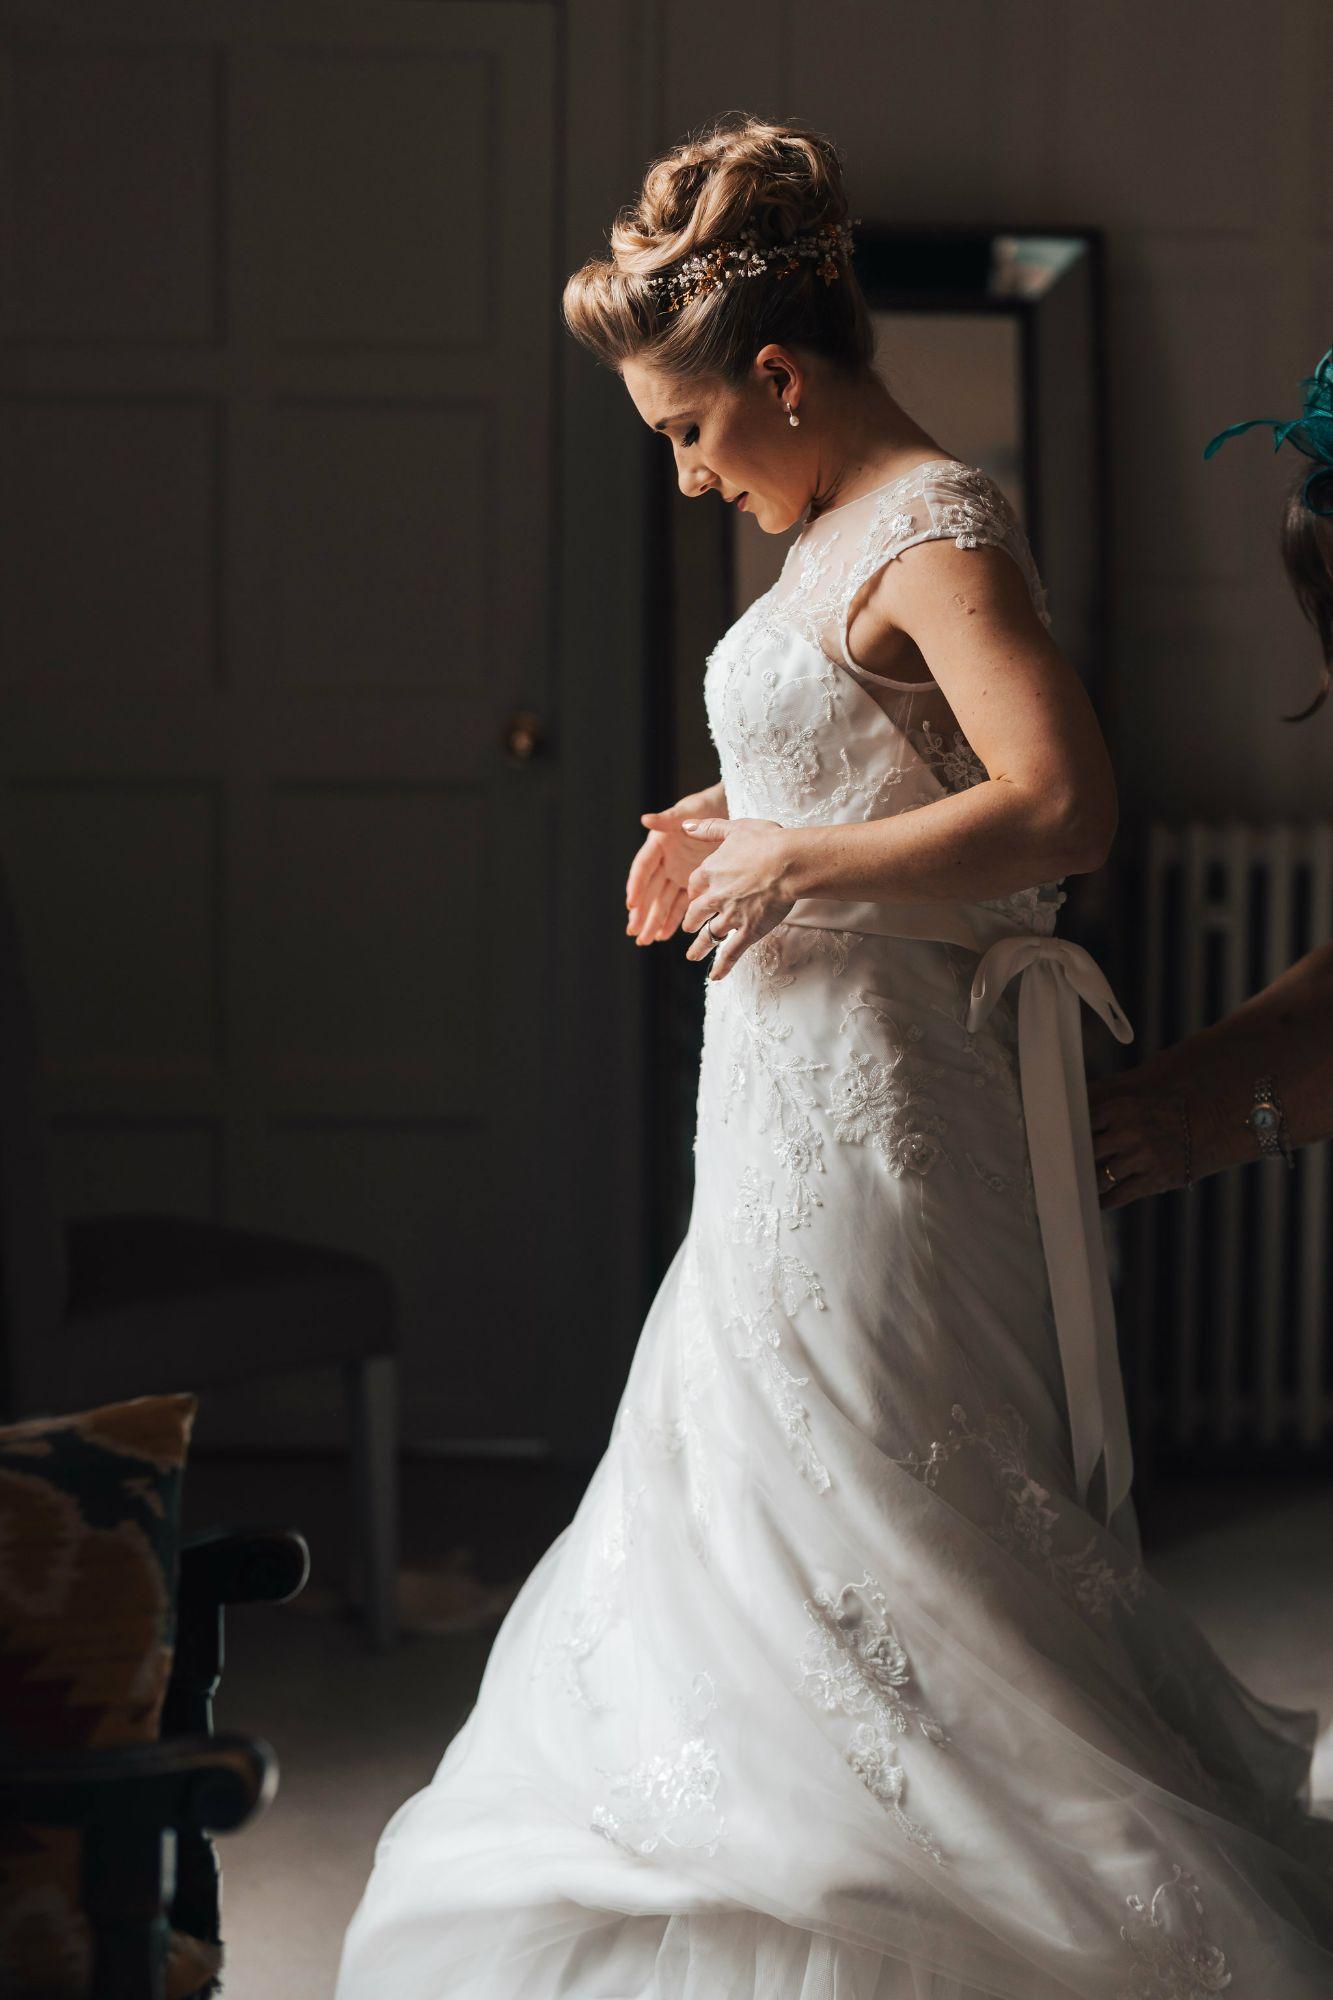 Colourful bridal and non-bridal wedding hair accessories